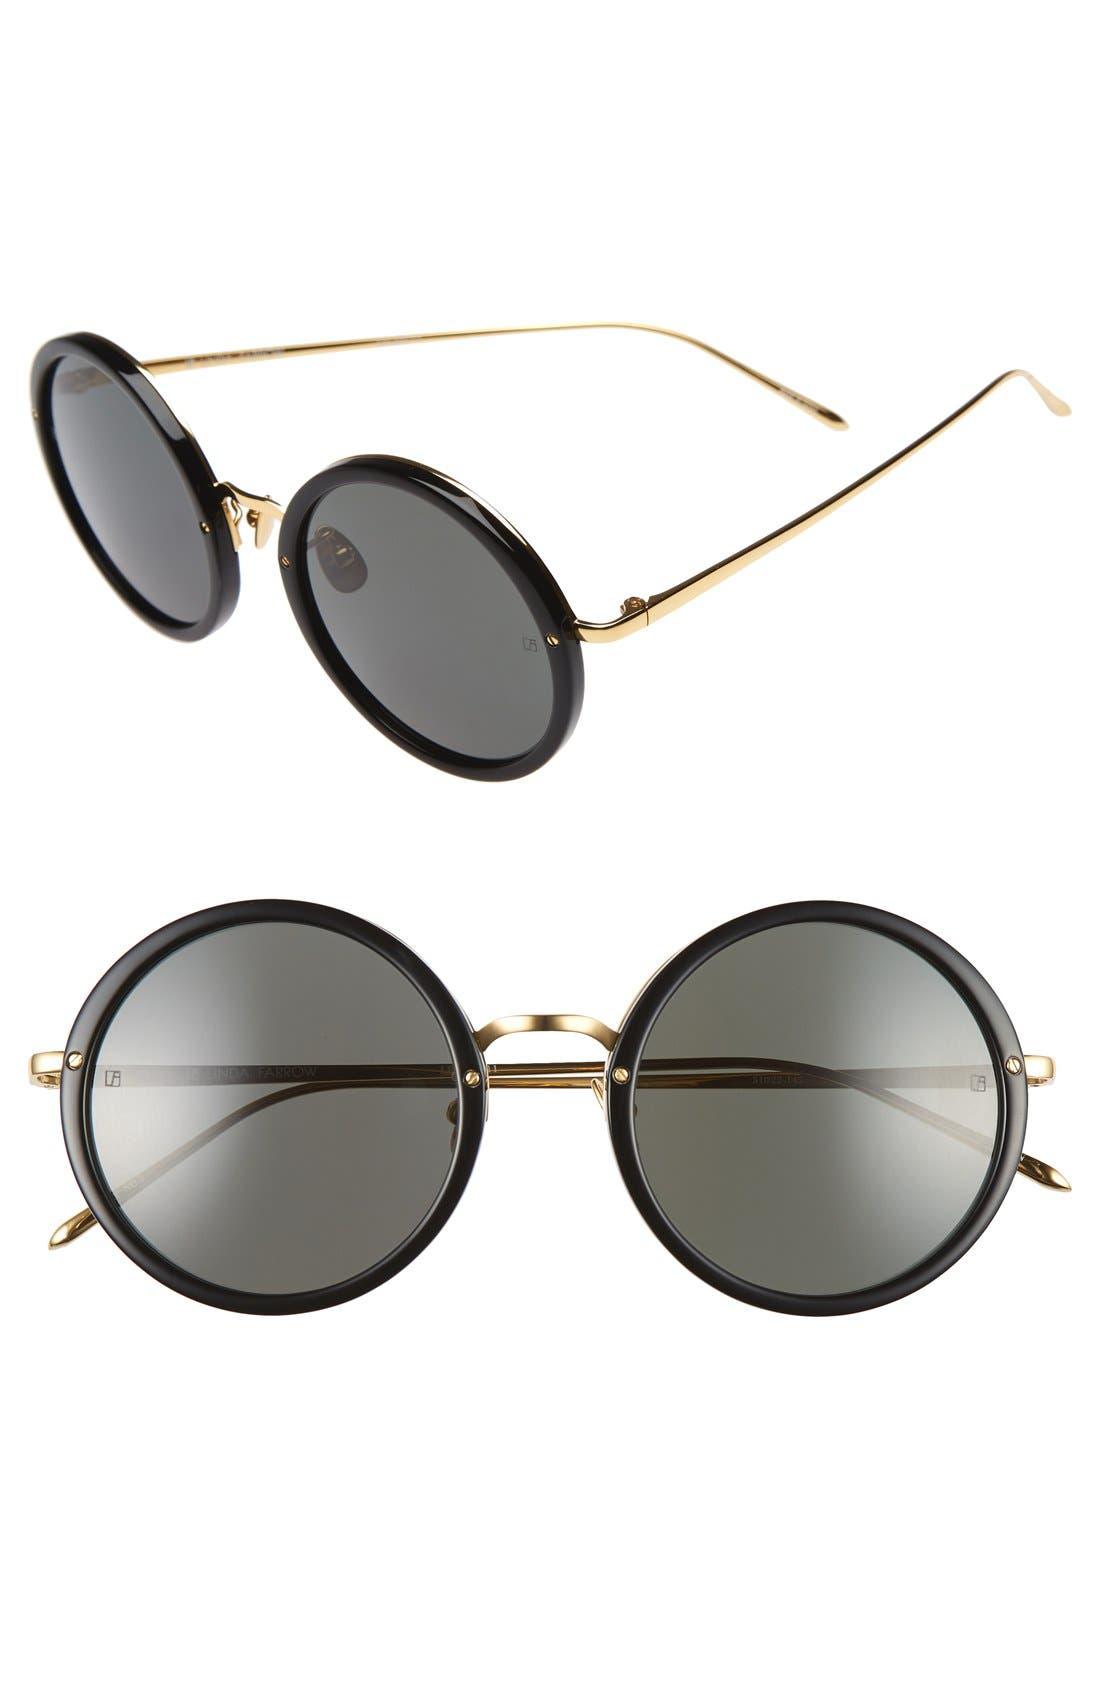 Alternate Image 1 Selected - Linda Farrow 51mm Round 24 Karat Gold Trim Sunglasses